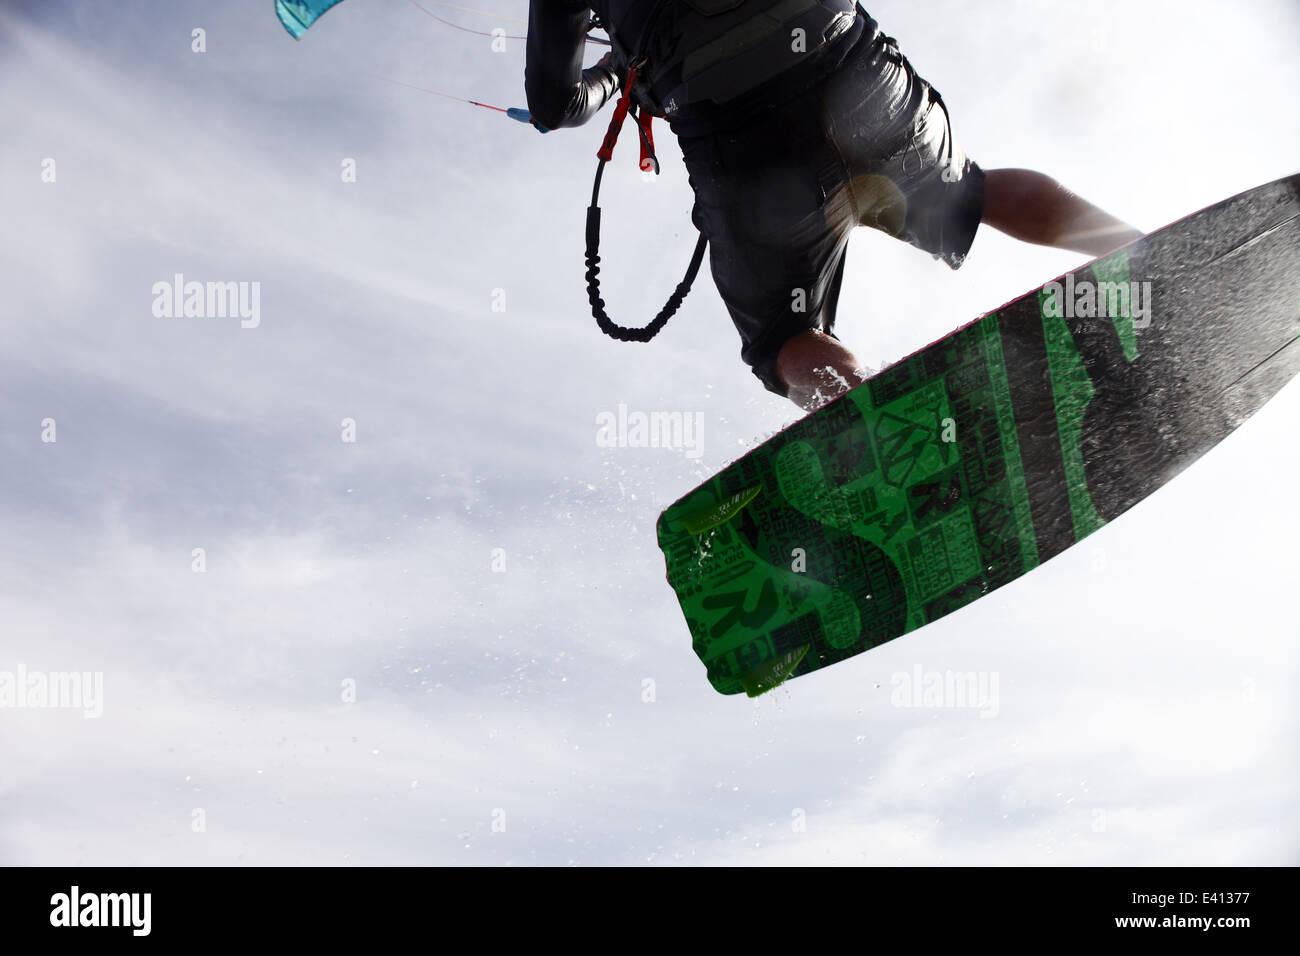 Man kitesurfing doing a jump on the lagoon in Dakhla, Western Sahara, Morocco - Stock Image